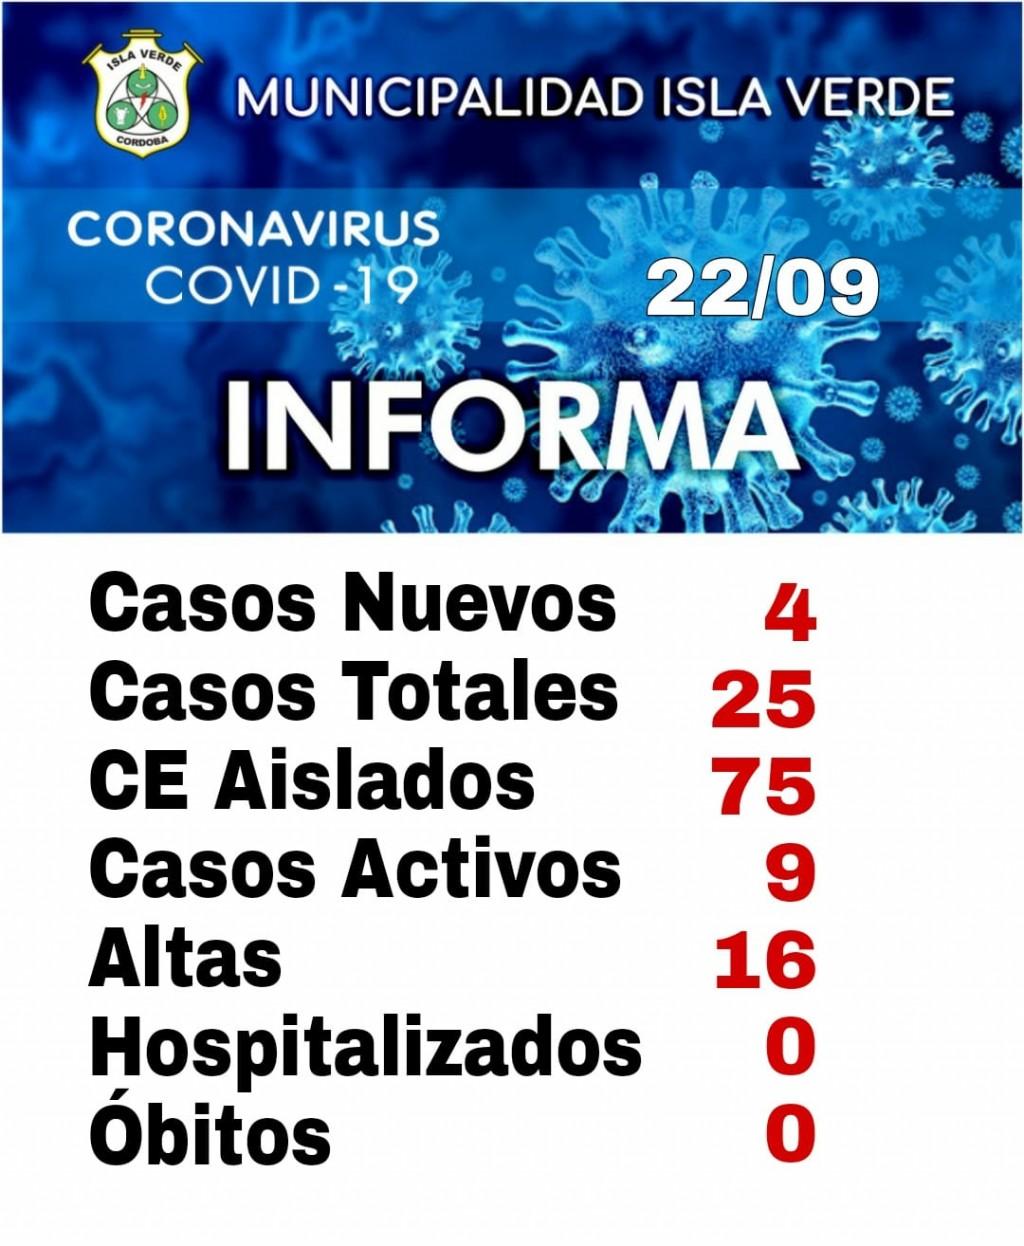 INFORME PAREMIOLÓGICO COVID-19